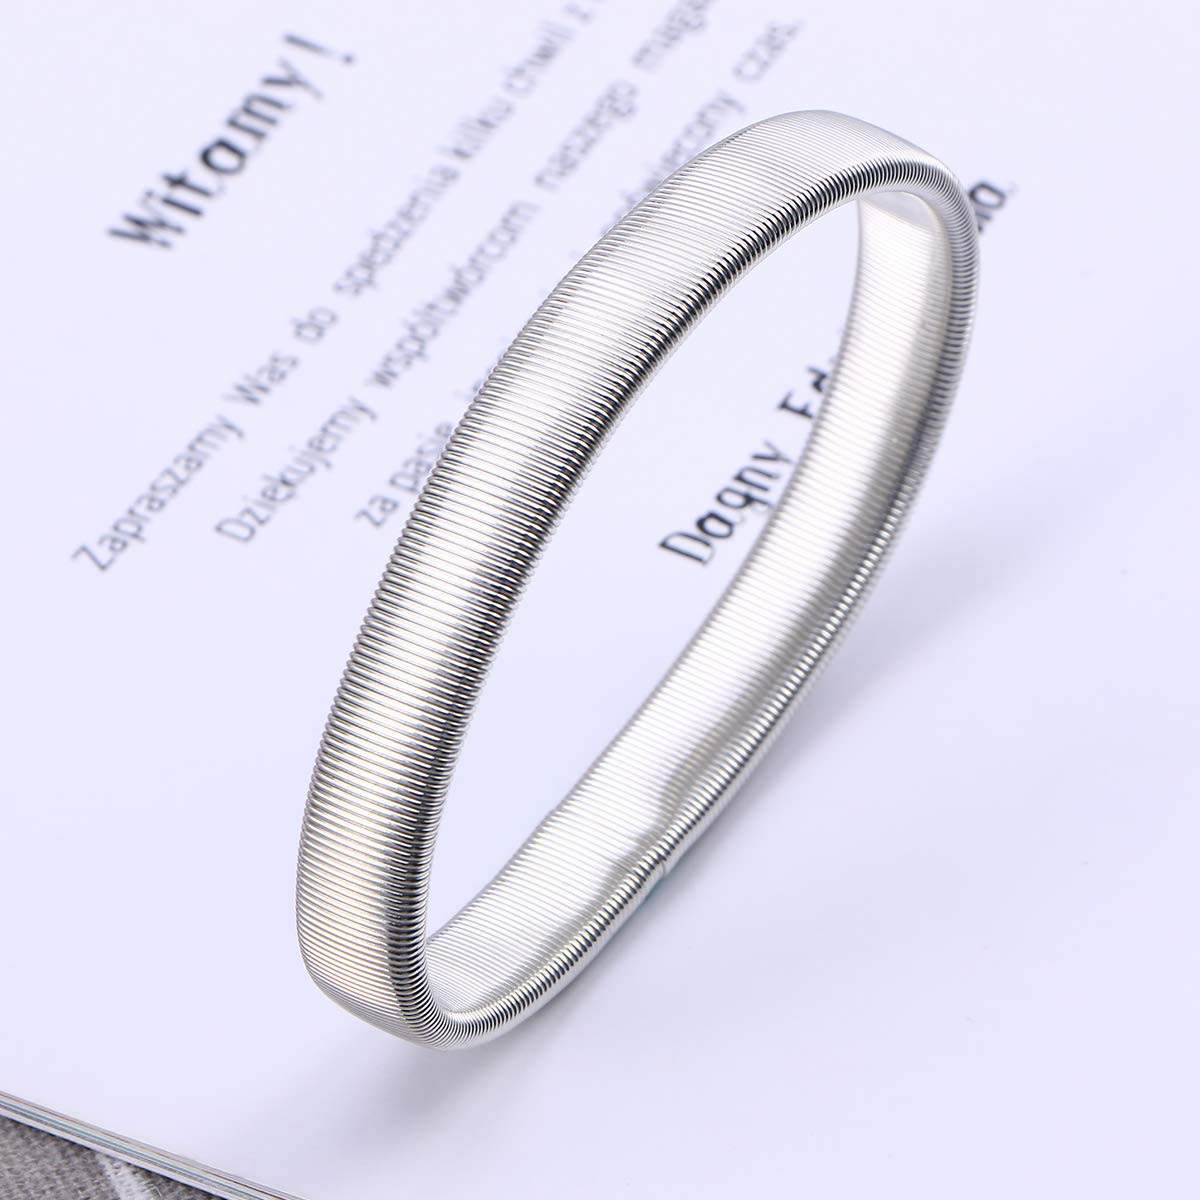 reggi-manica elastico per camicia da uomo ROSENICE color argento